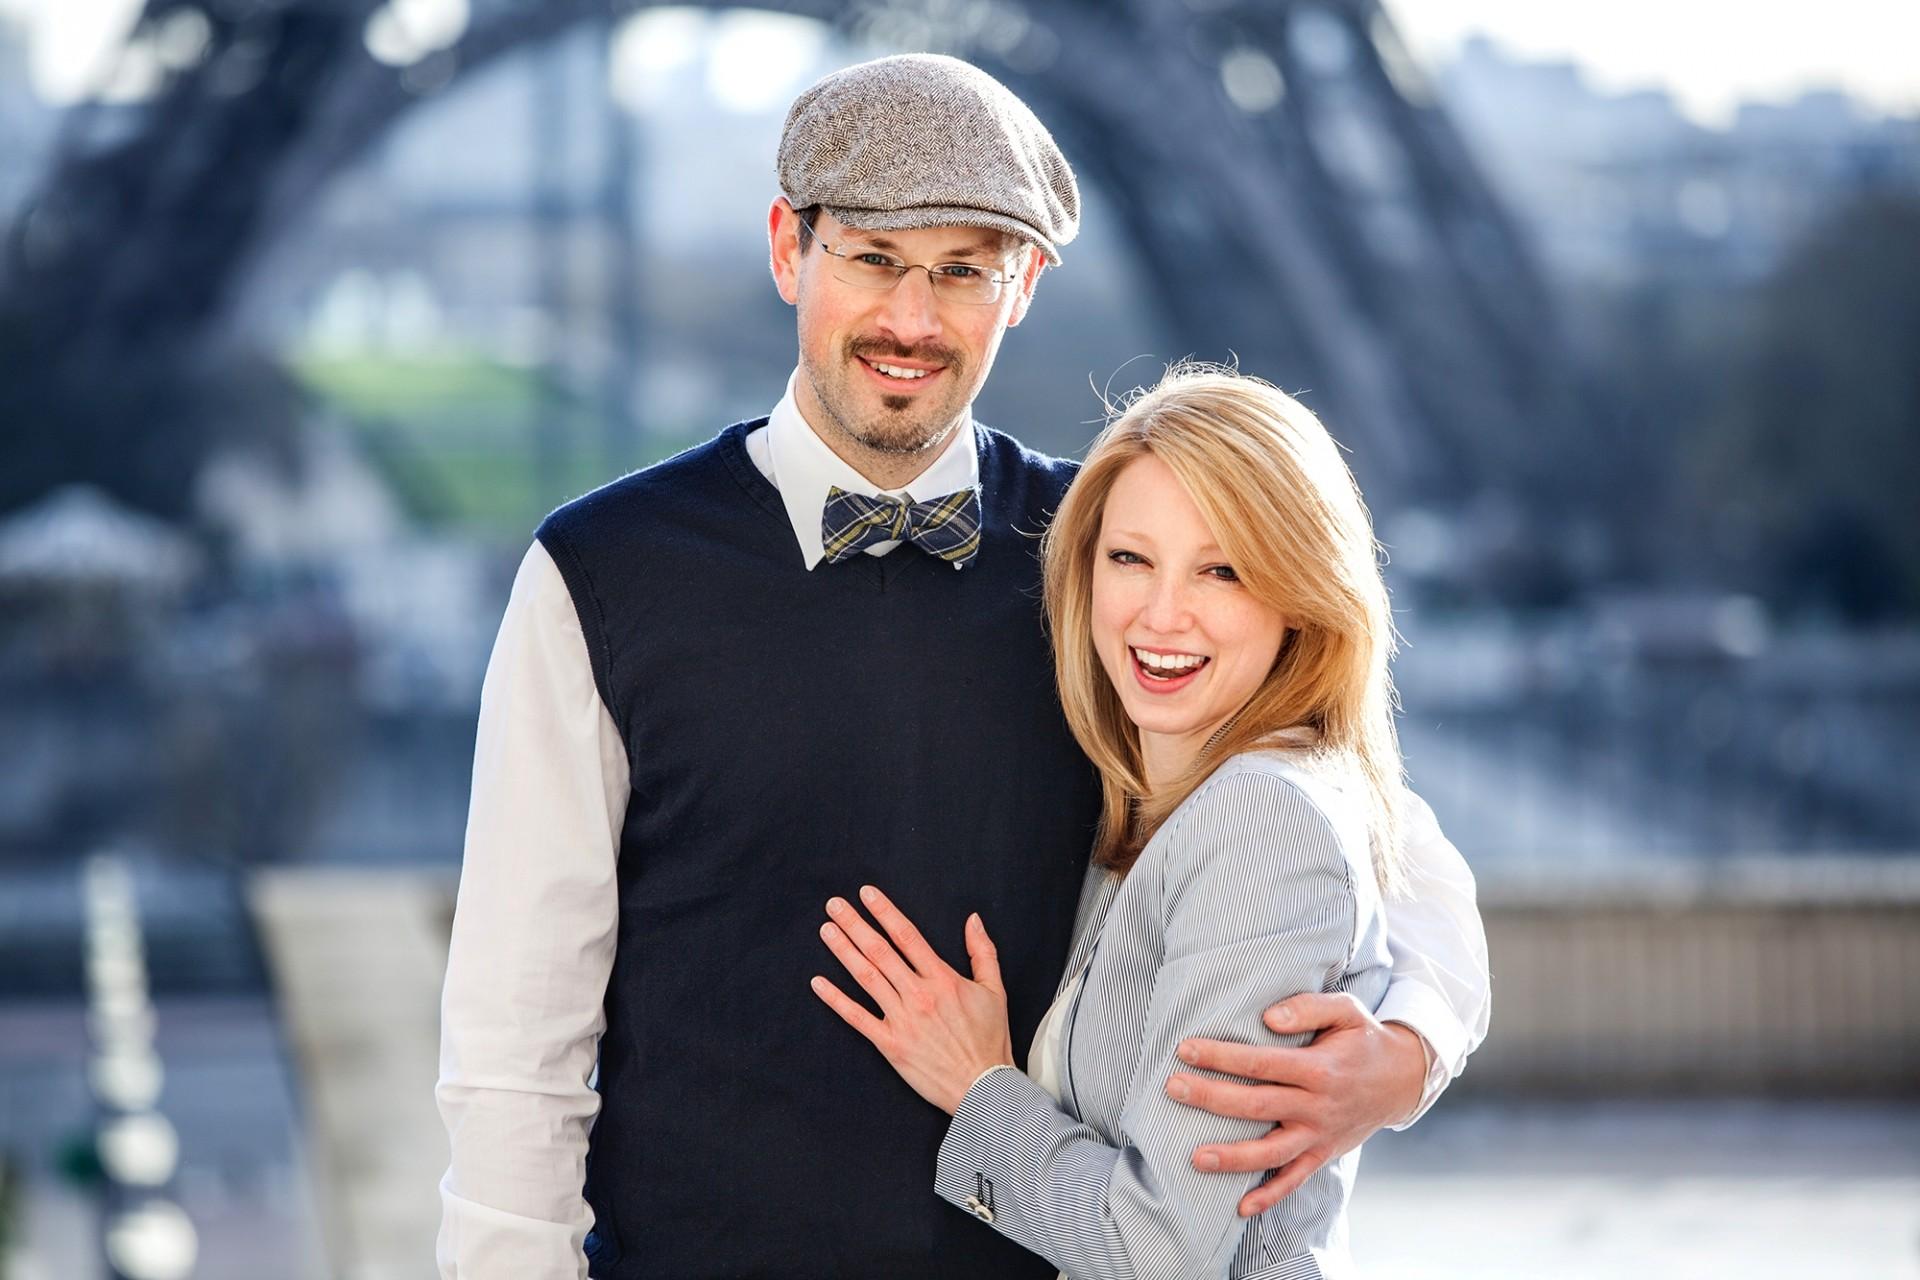 Paarshooting am Eiffelturm